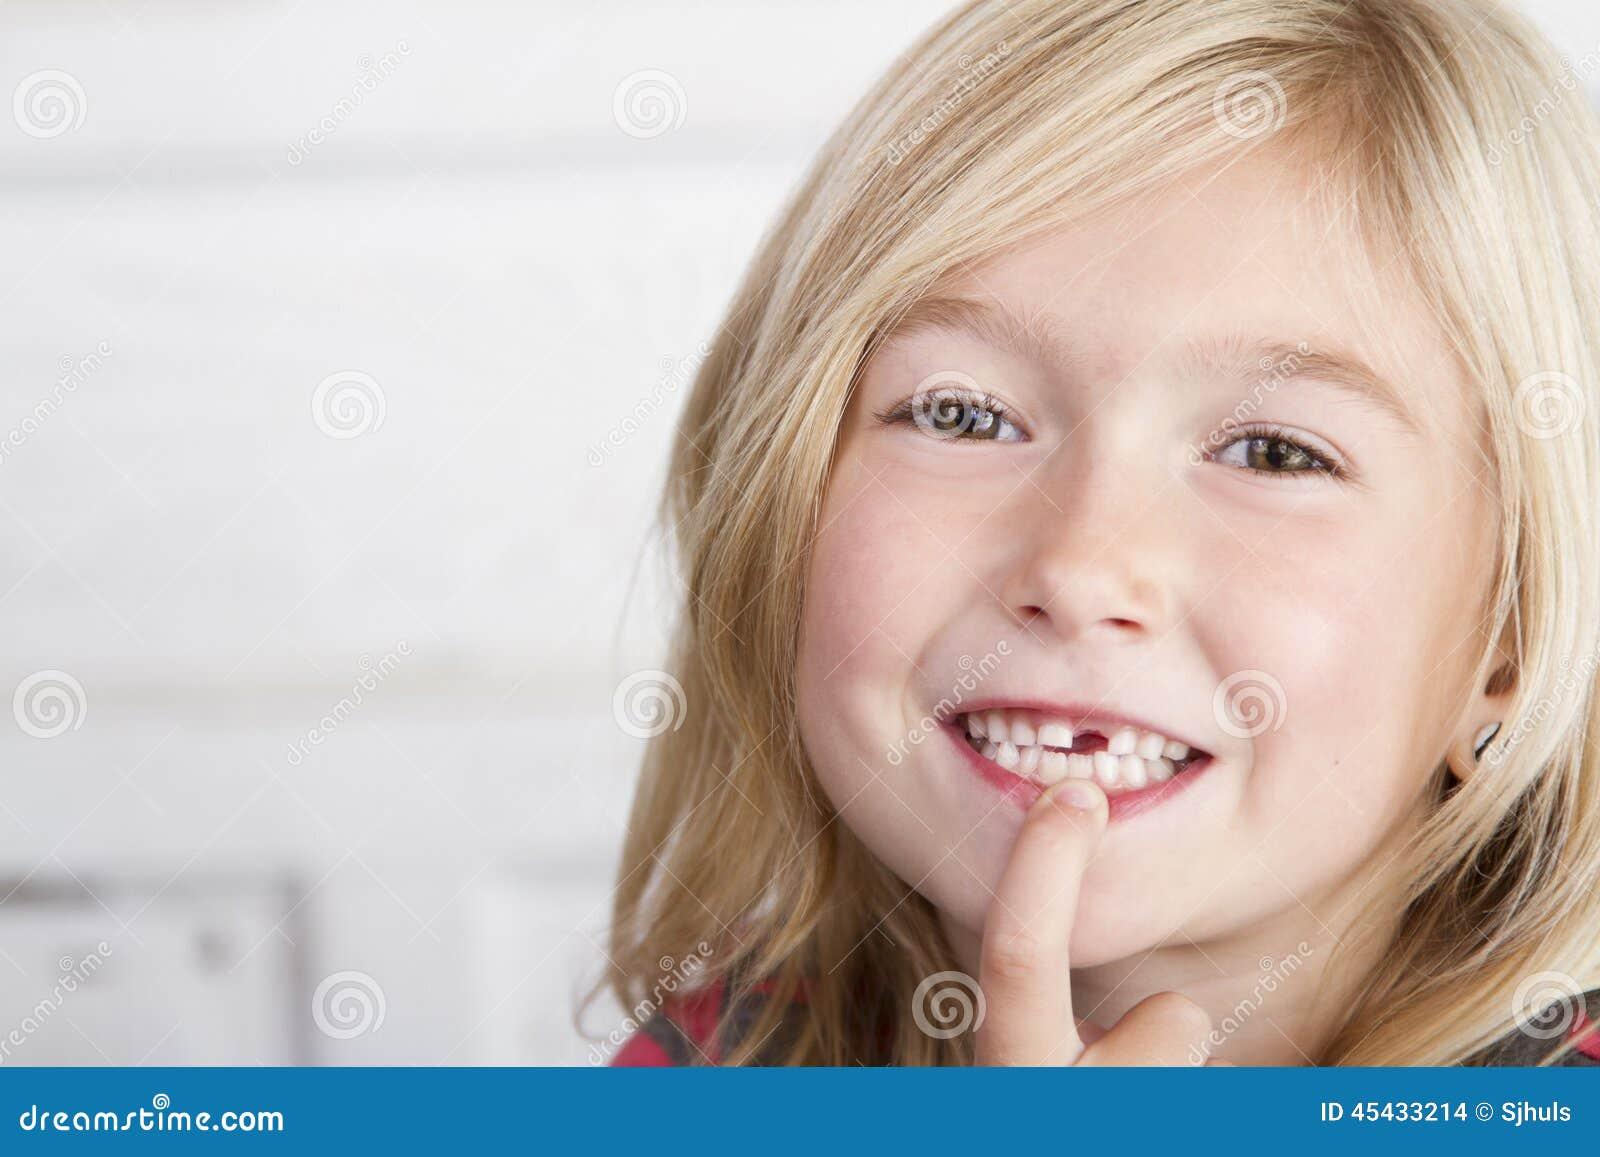 Dente anteriore mancante del bambino